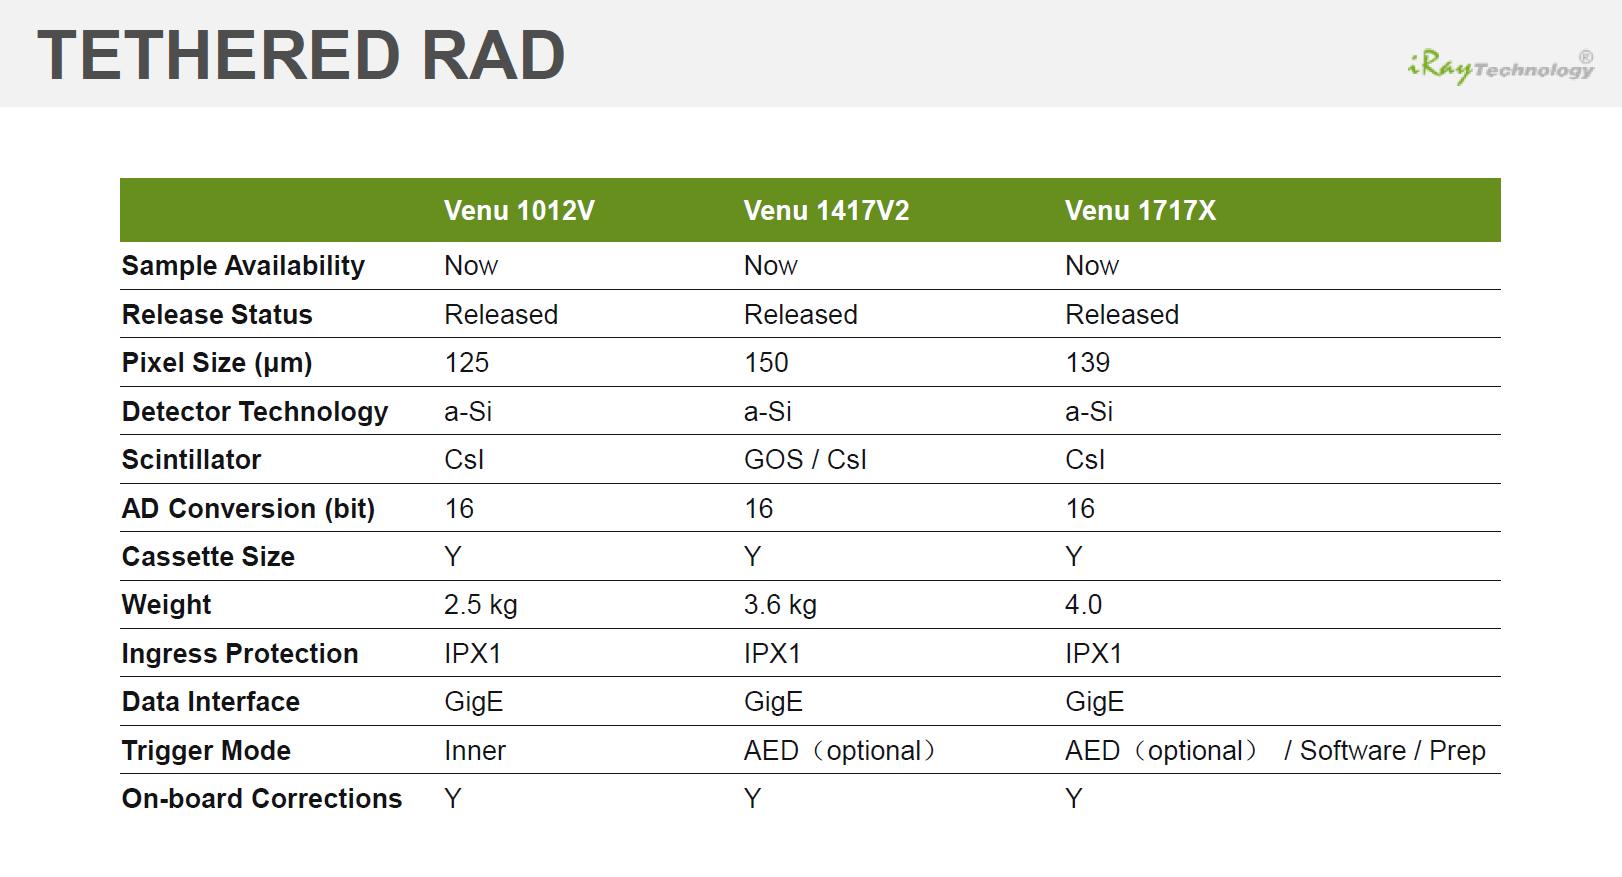 tethered Rad